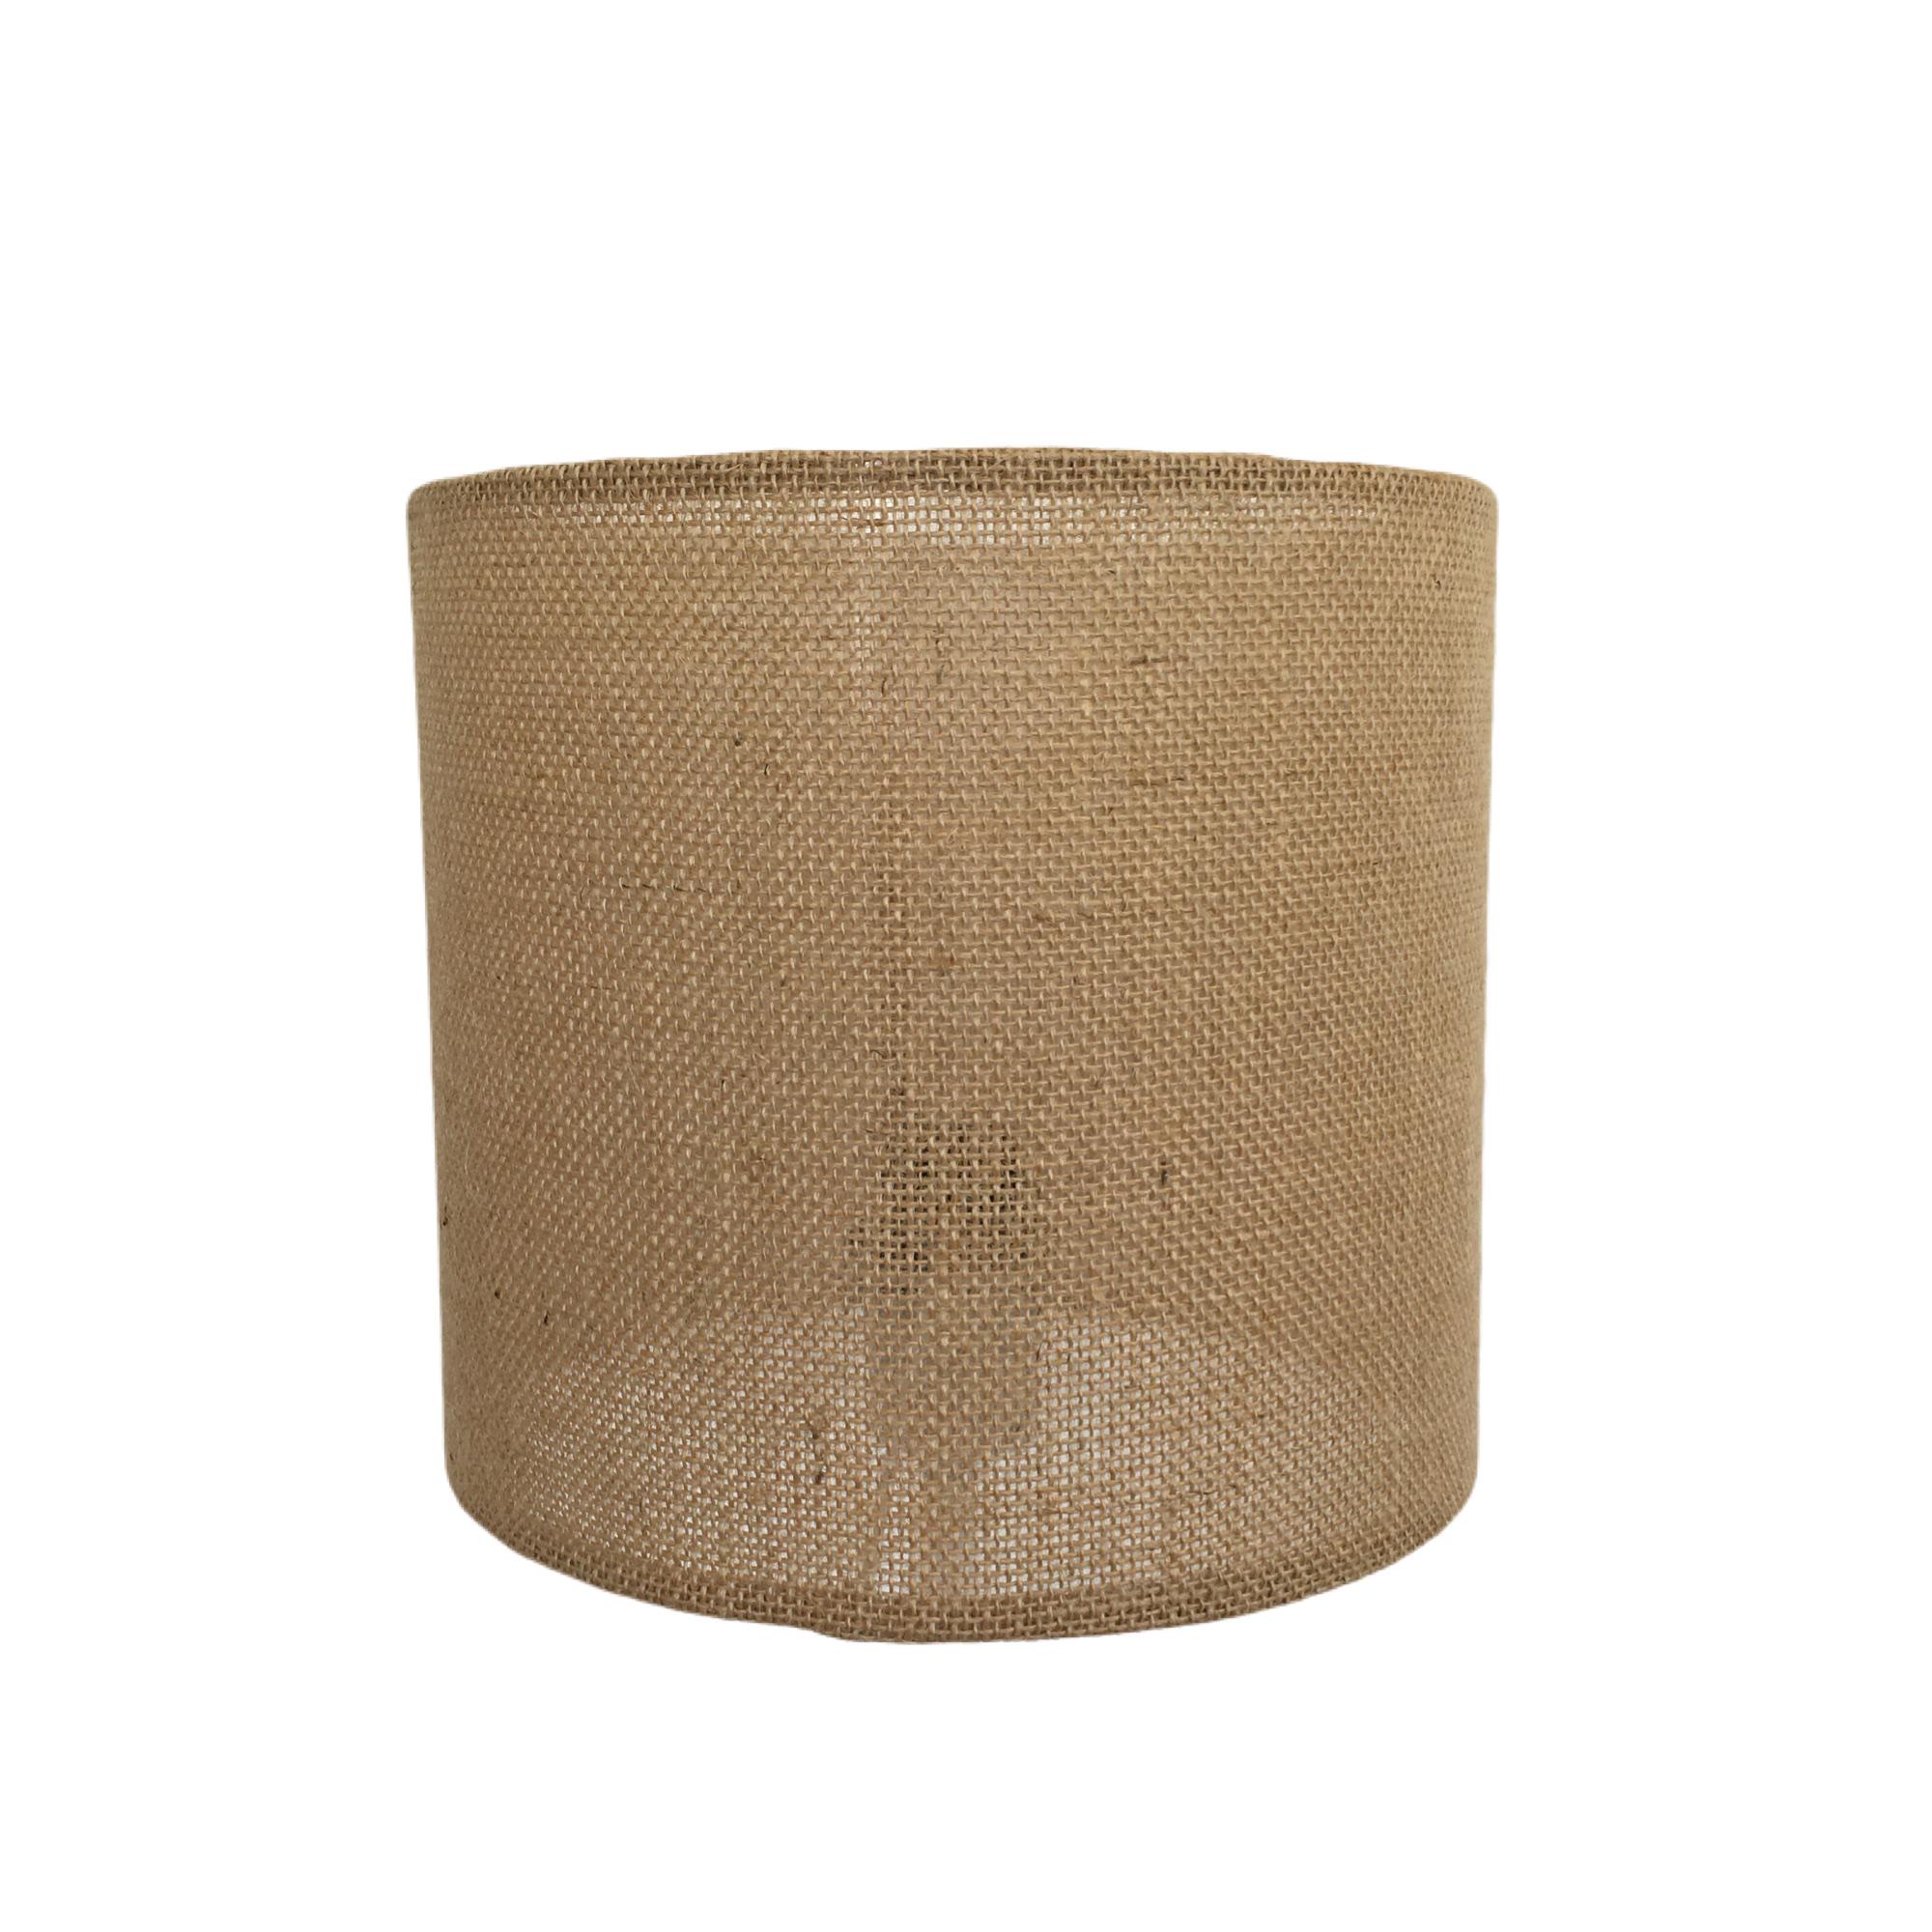 Suspension toile de jute diamètre 40 cm